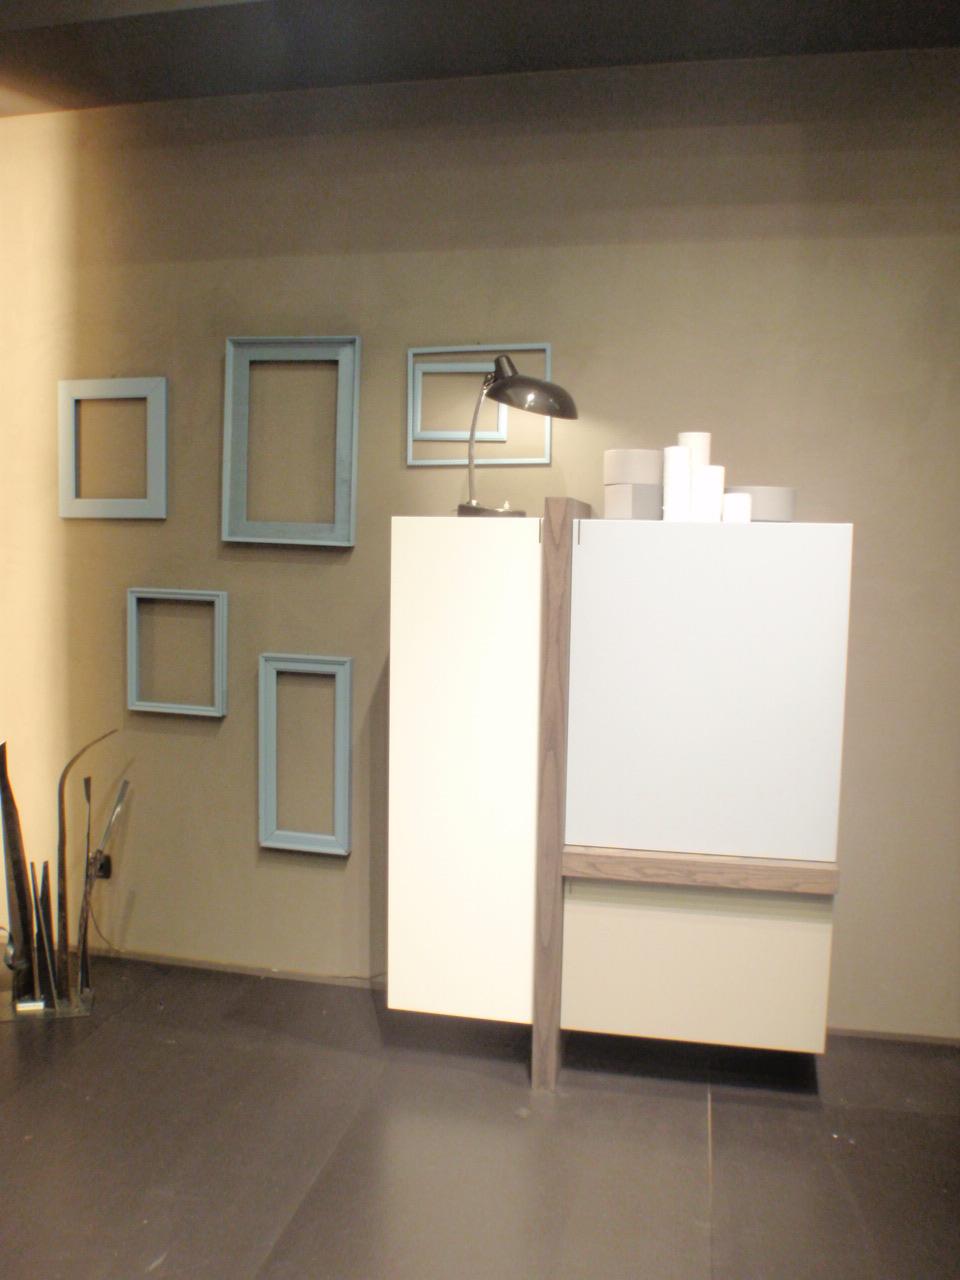 madia t line fimar mobili salone del mobile 2014